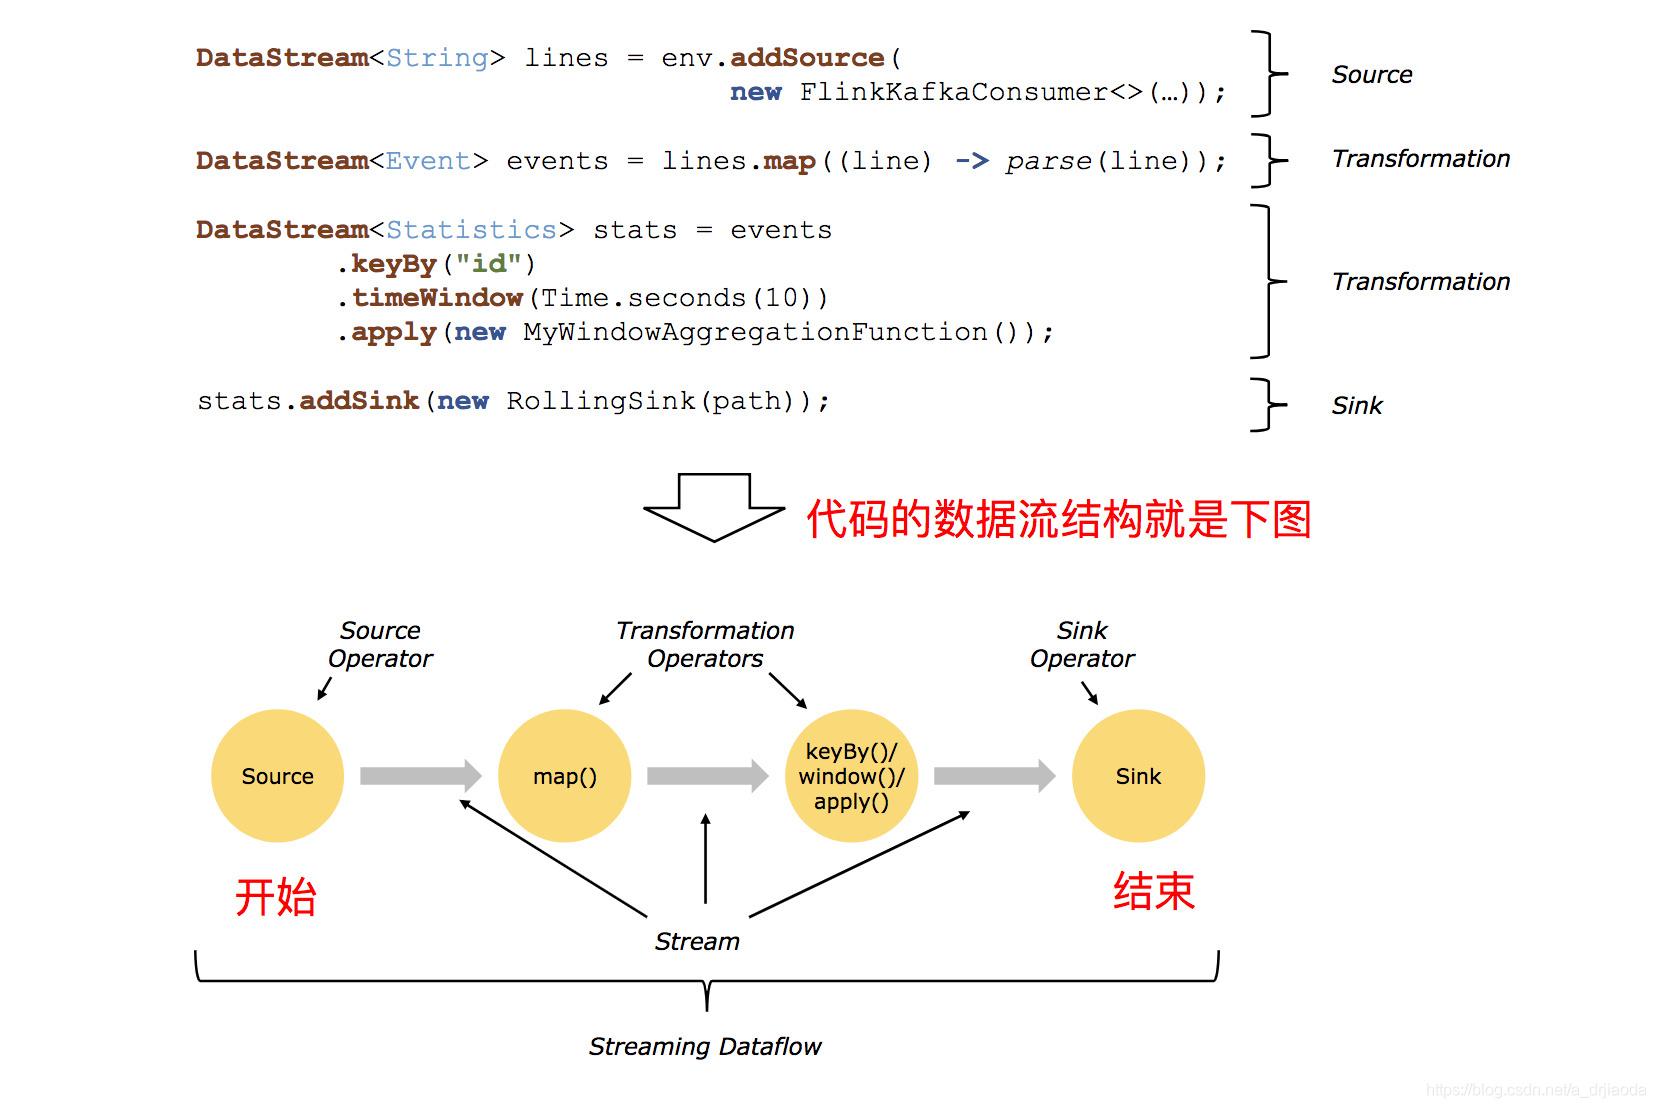 https://img-blog.csdnimg.cn/20190417165601297.jpg?x-oss-process=image/watermark,type_ZmFuZ3poZW5naGVpdGk,shadow_10,text_aHR0cHM6Ly9ibG9nLmNzZG4ubmV0L2FfZHJqaWFvZGE=,size_16,color_FFFFFF,t_70